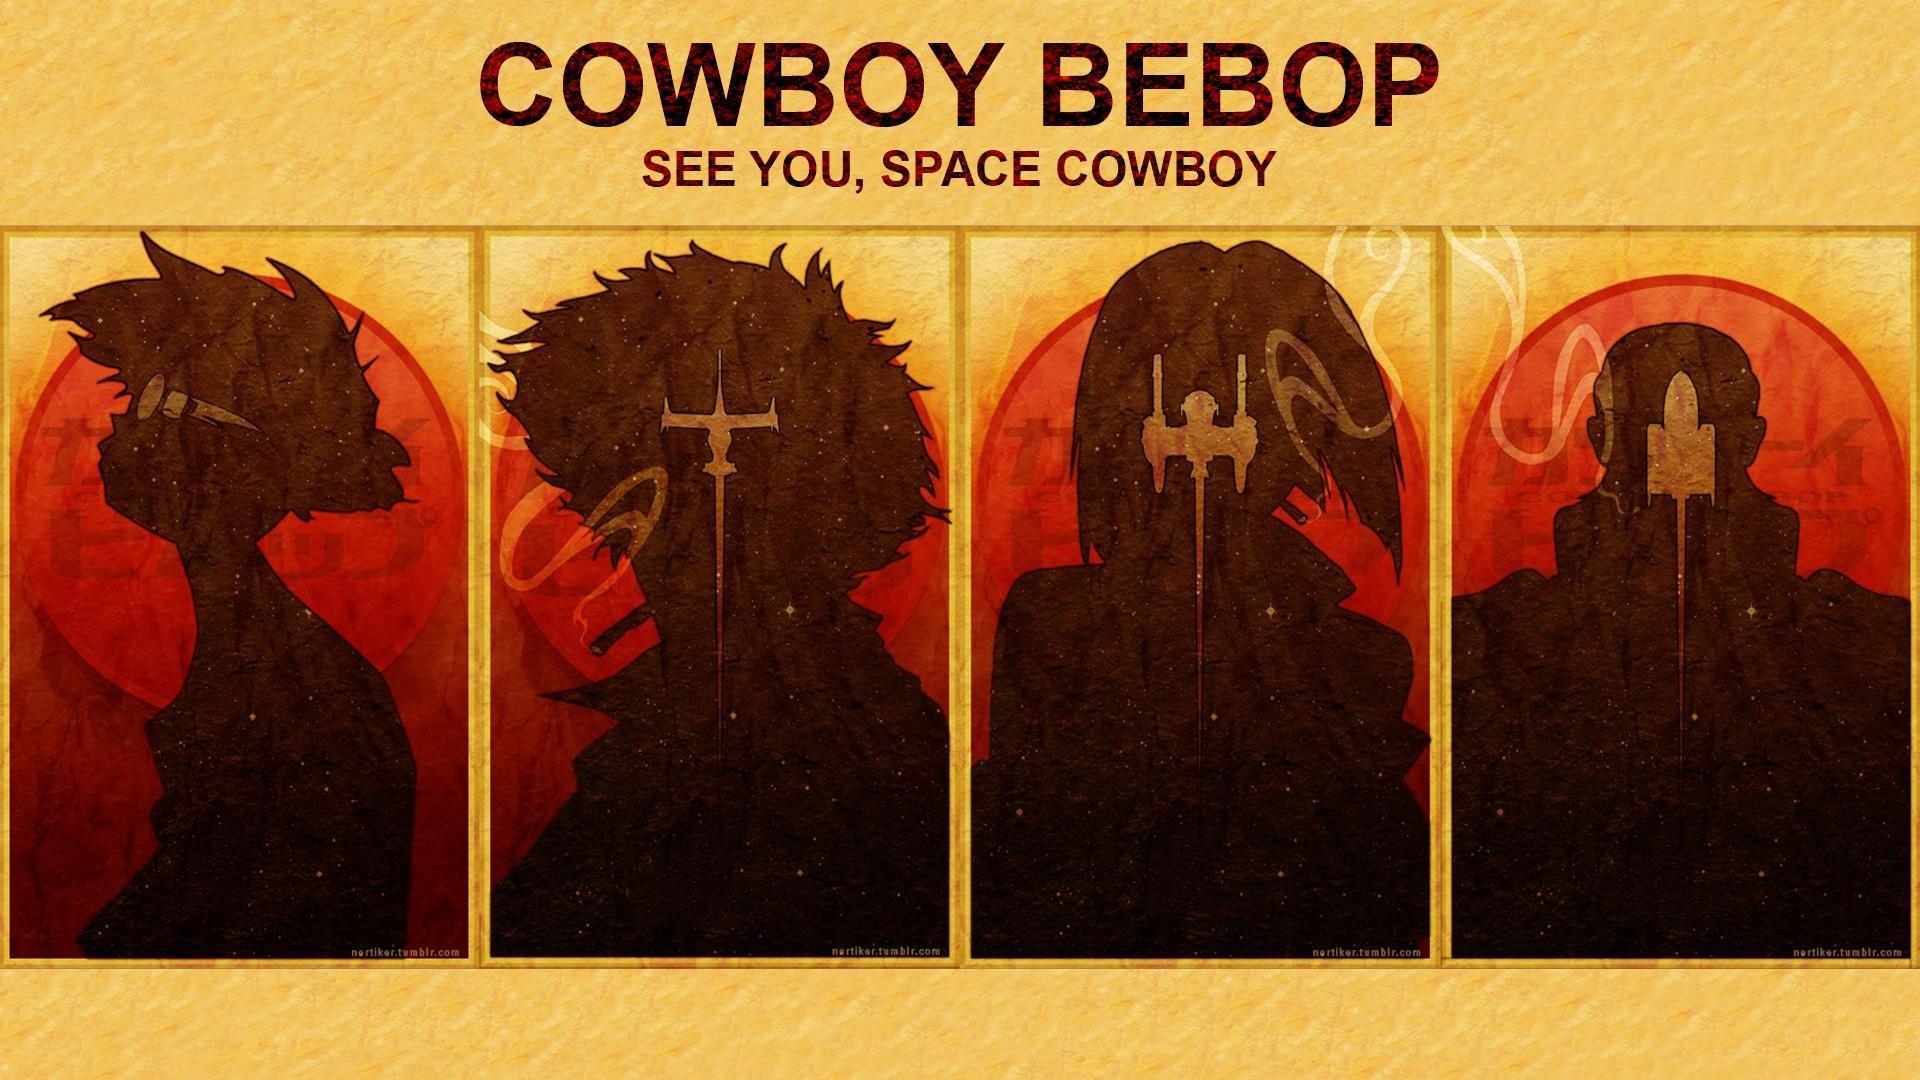 Wallpapers | Cowboy Bebop